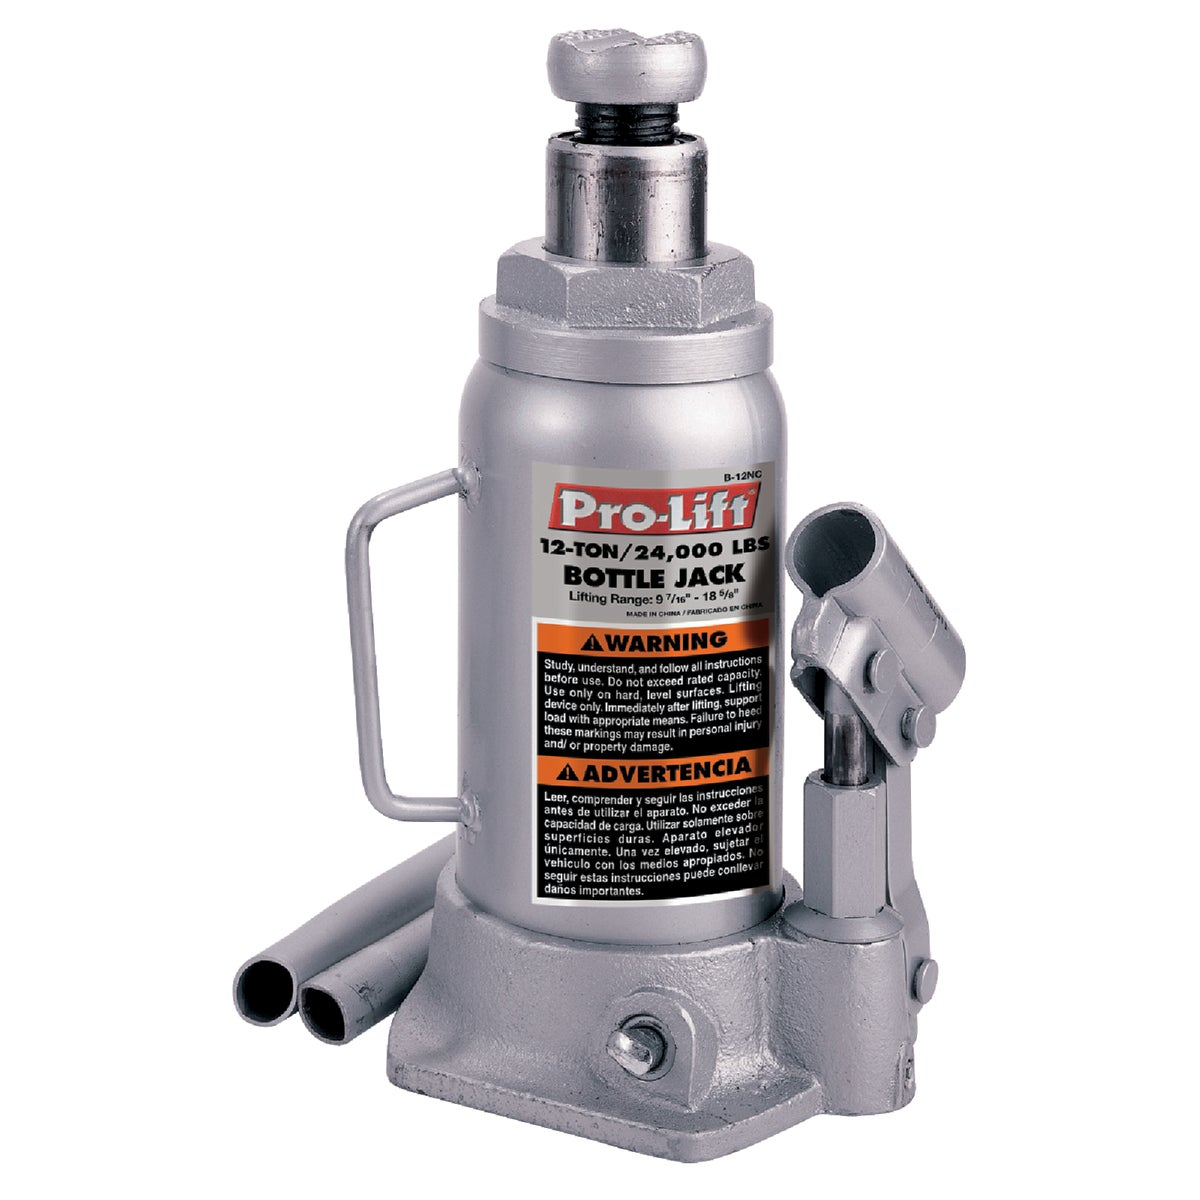 Pro-Lift B-012D Grey Hydraulic Bottle Jack - 12 Ton Capacity